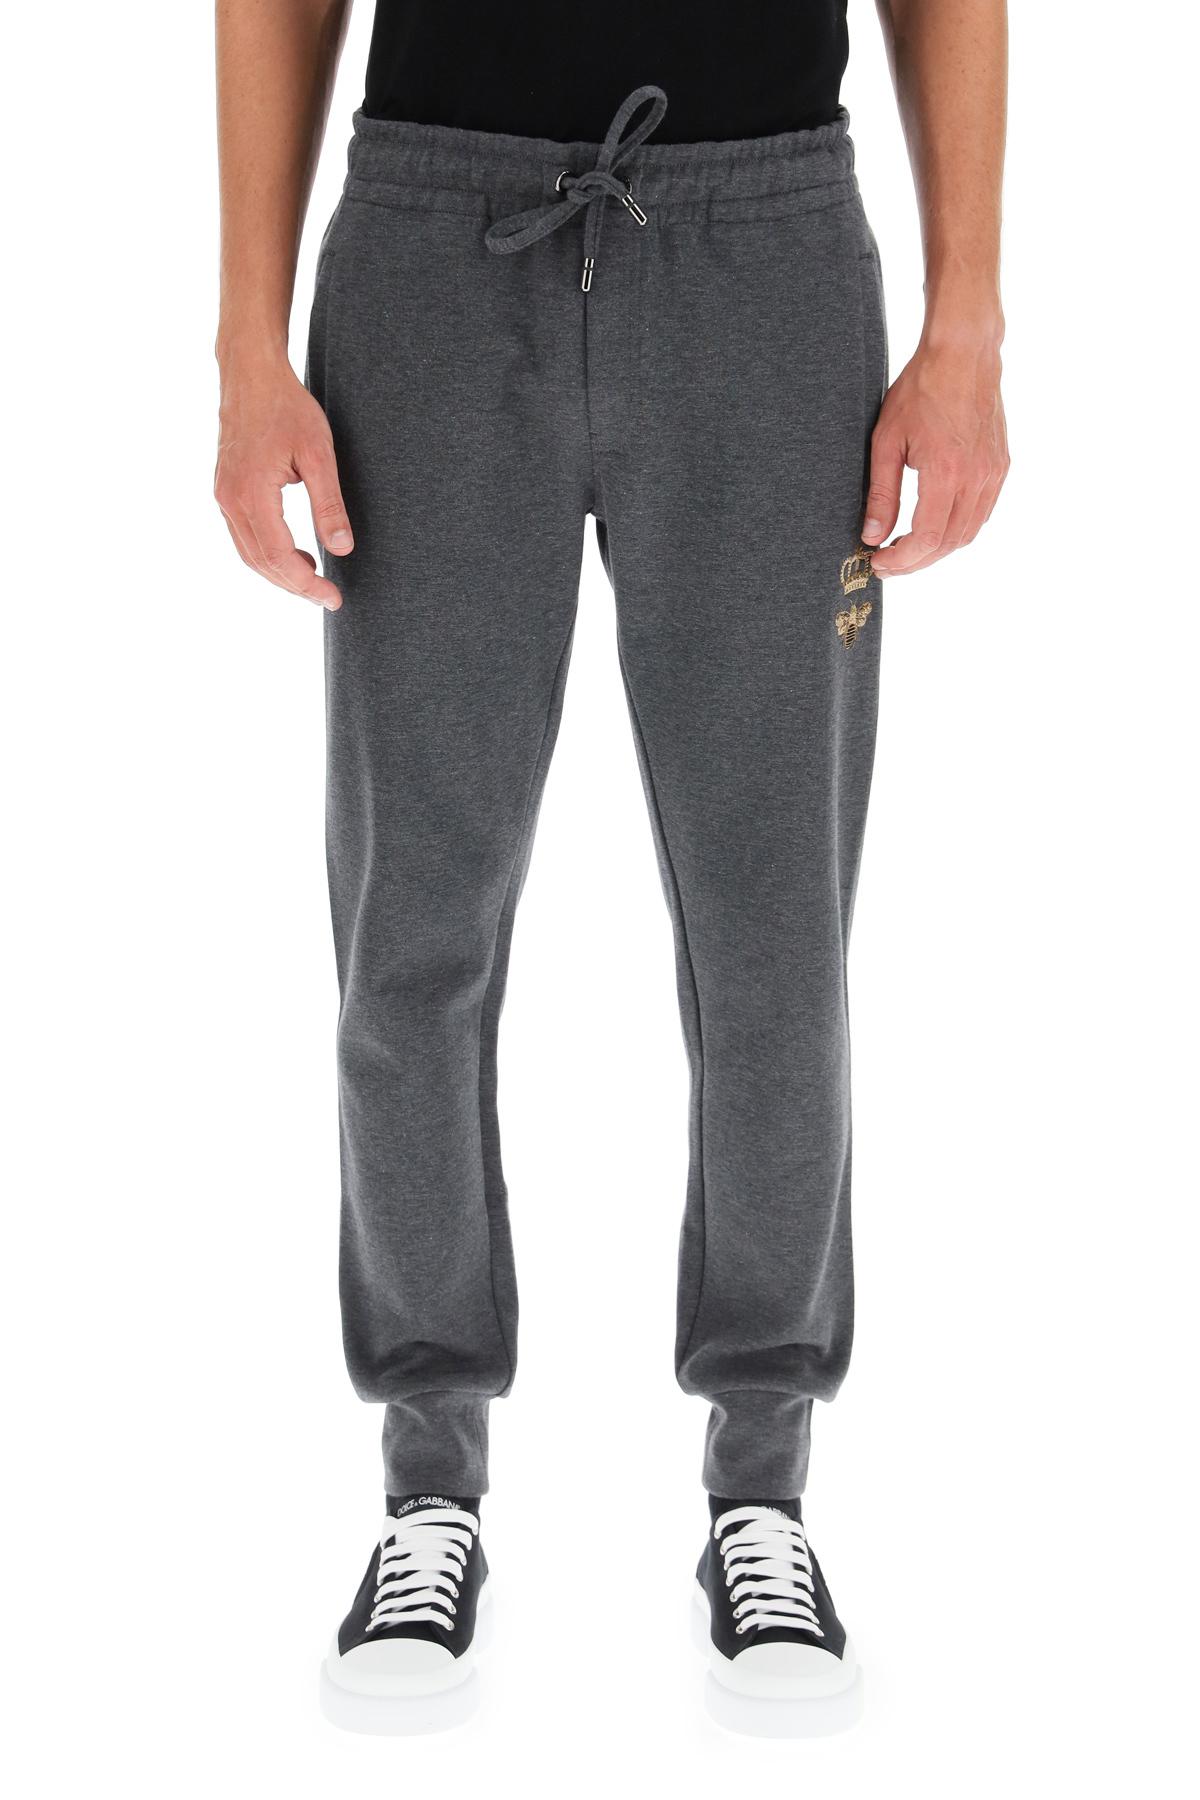 Dolce & gabbana pantalone jogging ape e corona in filo lurex